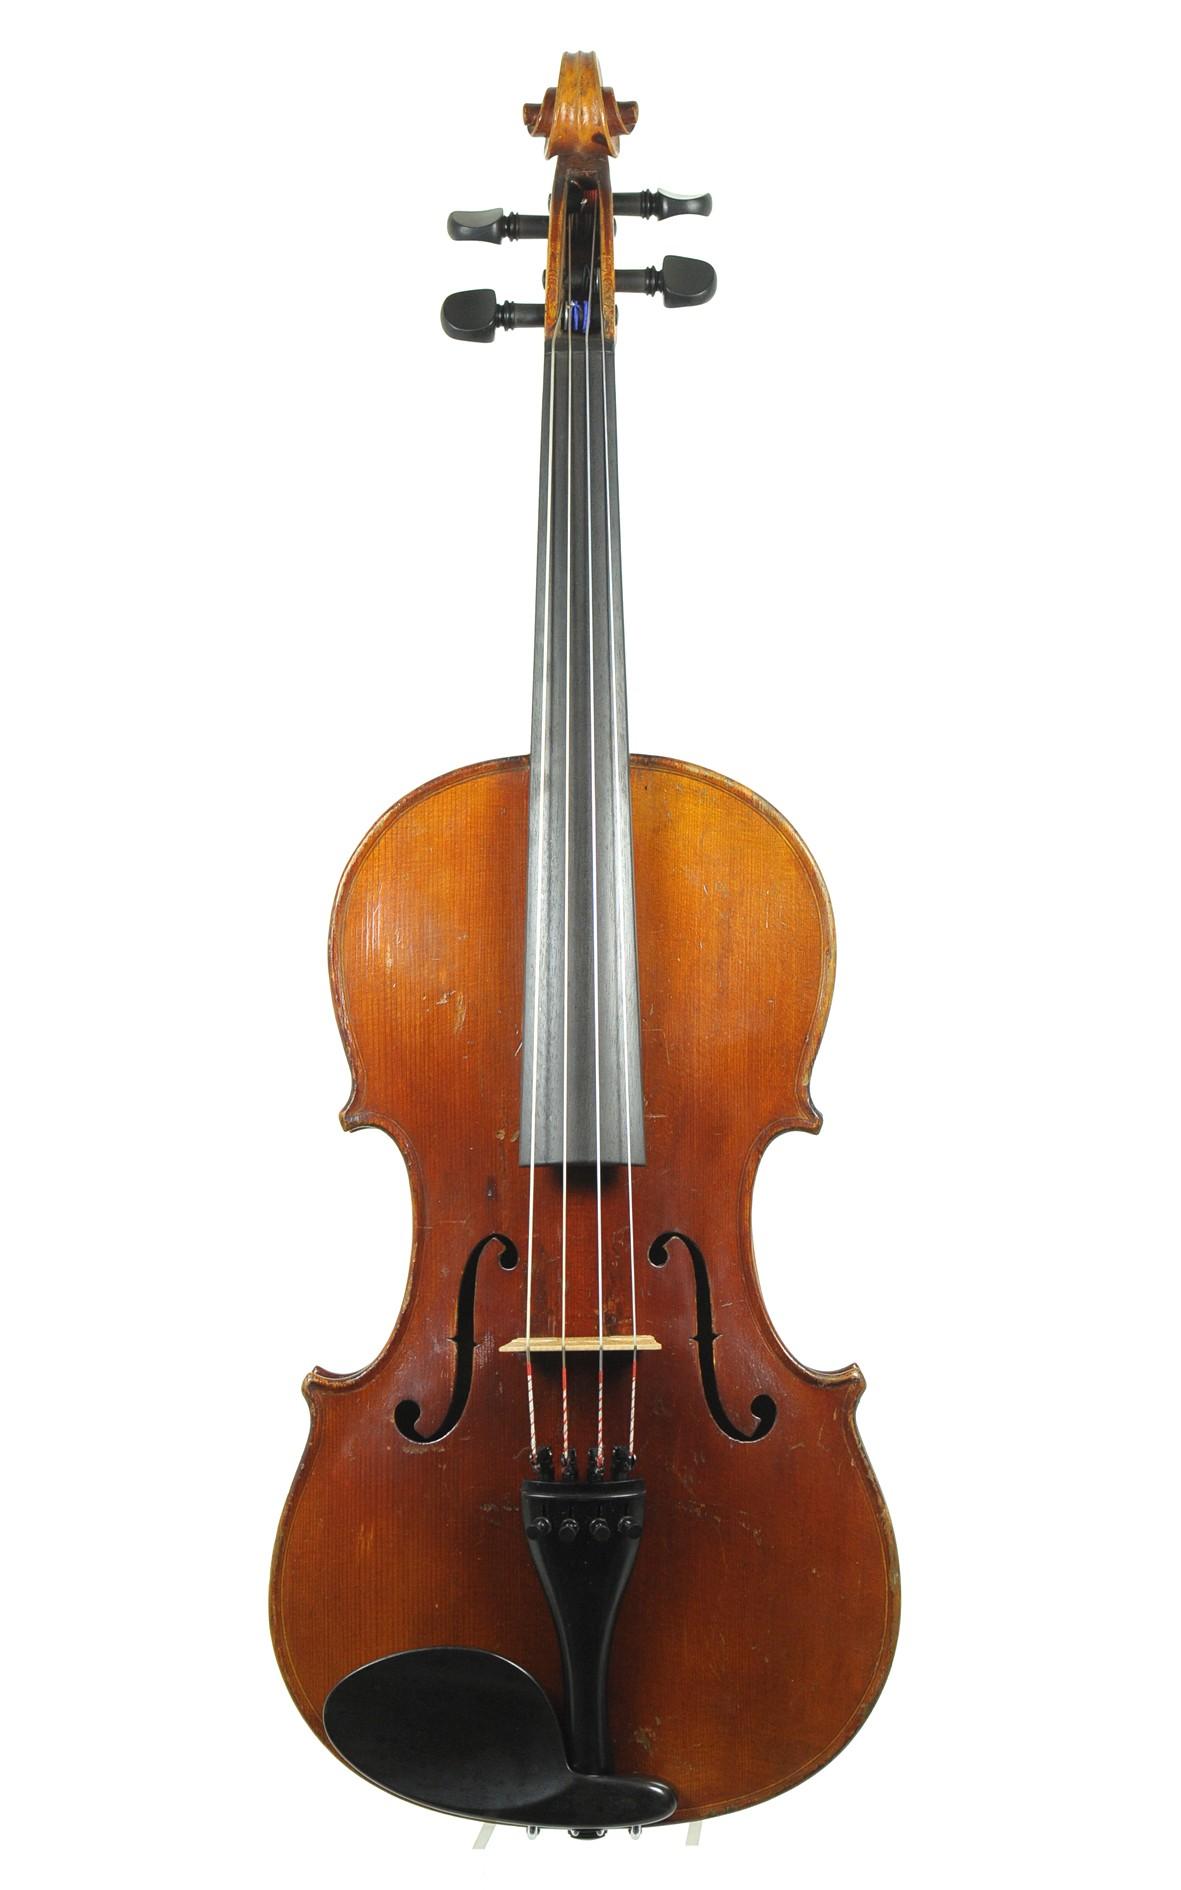 Mittenwald viola, approx. 1870 - top